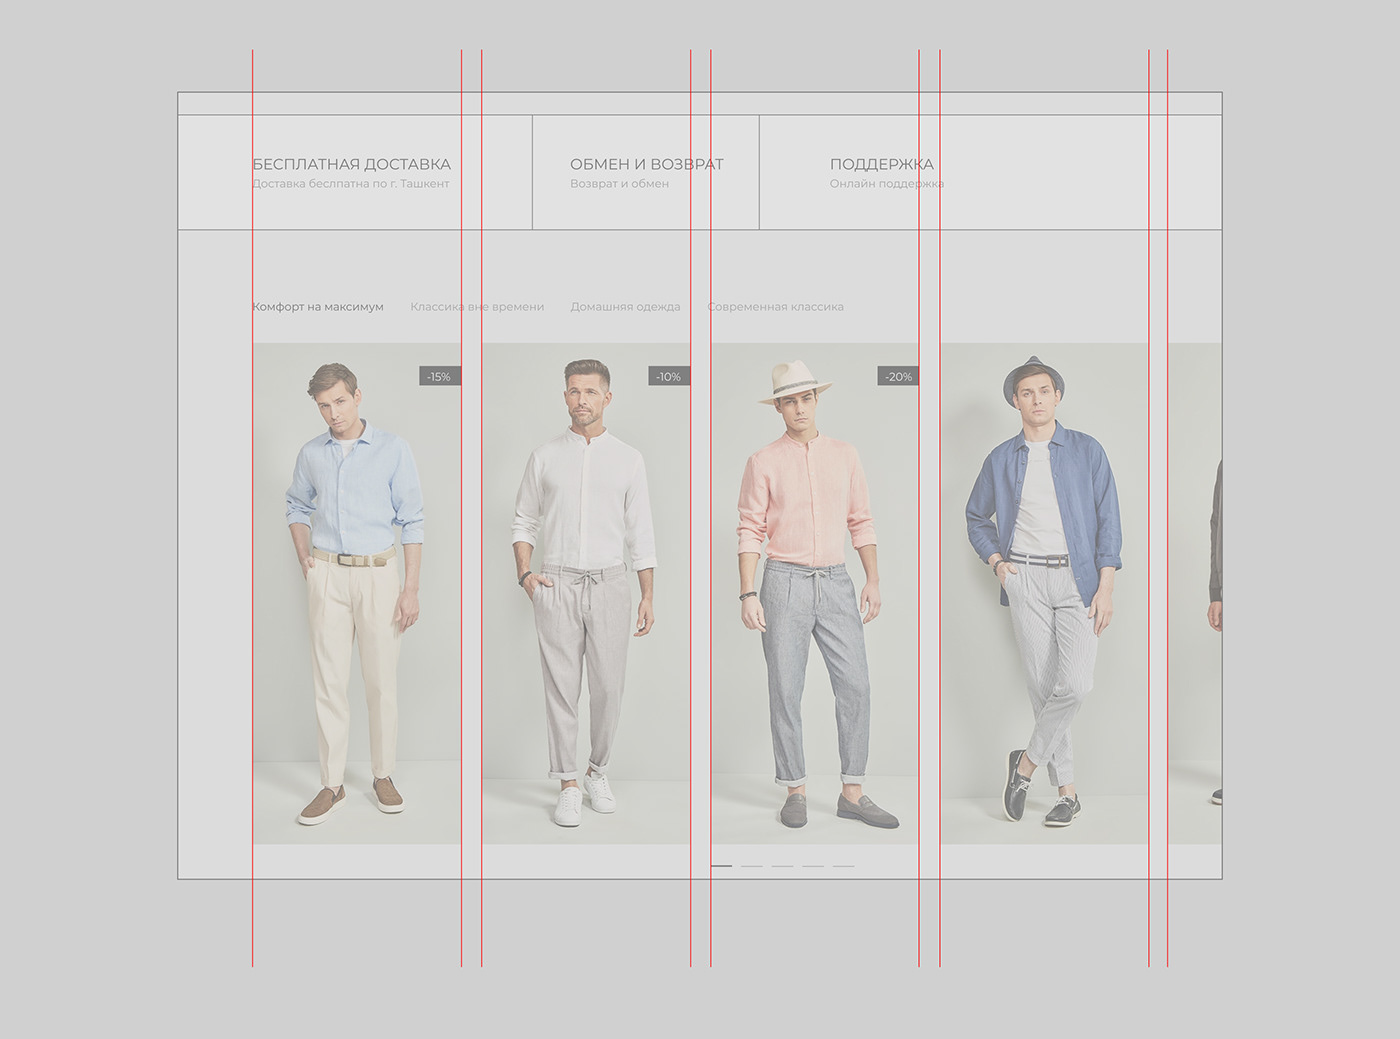 clothes Clothing Online shop shop store Style